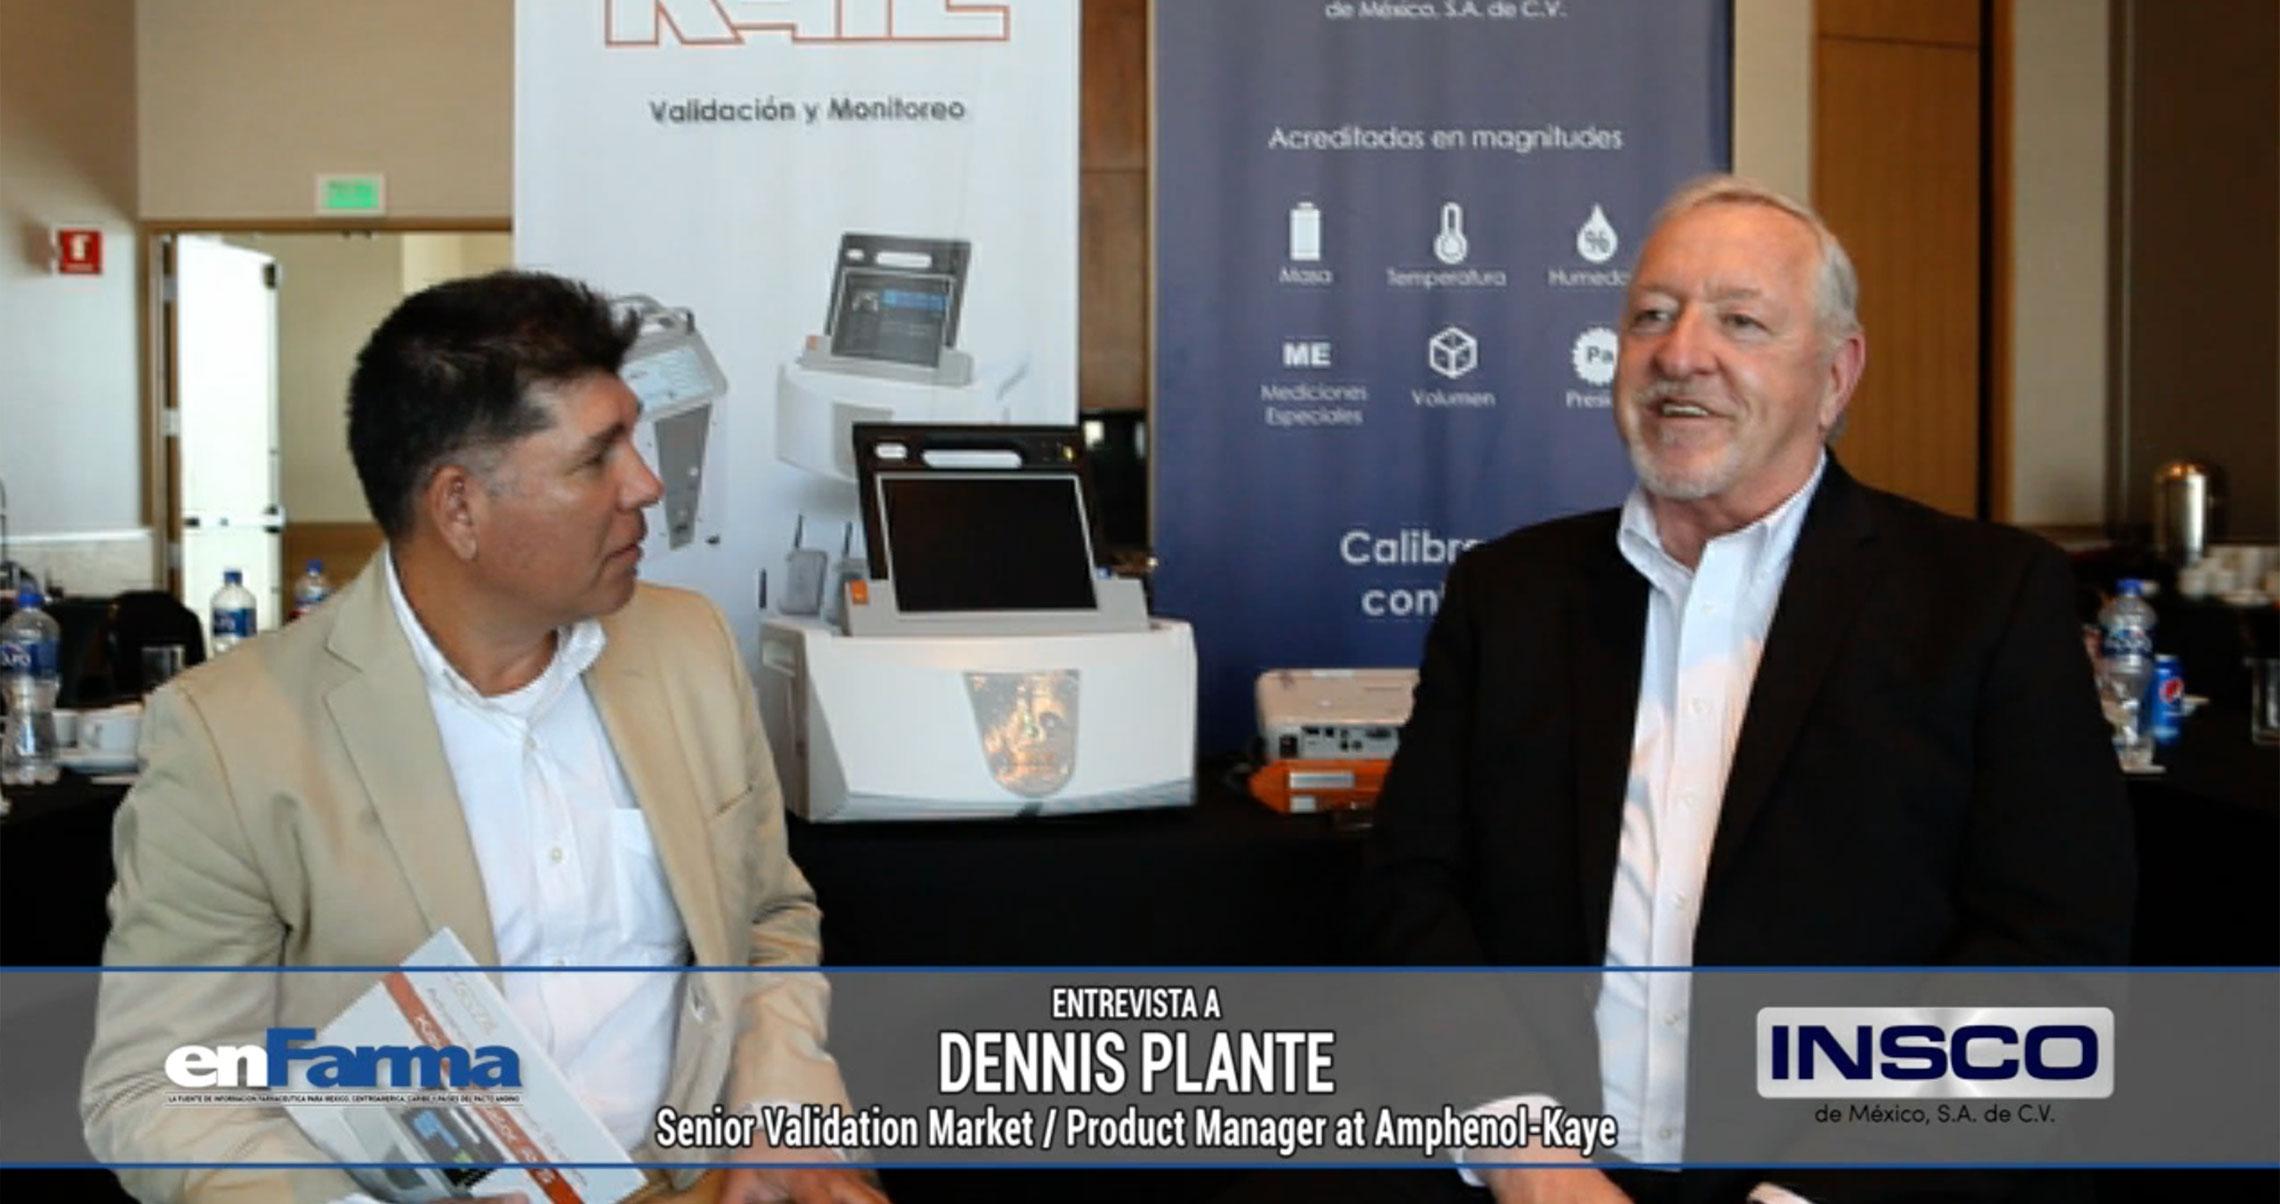 Entrevista a Dennis Plante - Senior Validation Manager / Product Manager at Amphenol-Kaye